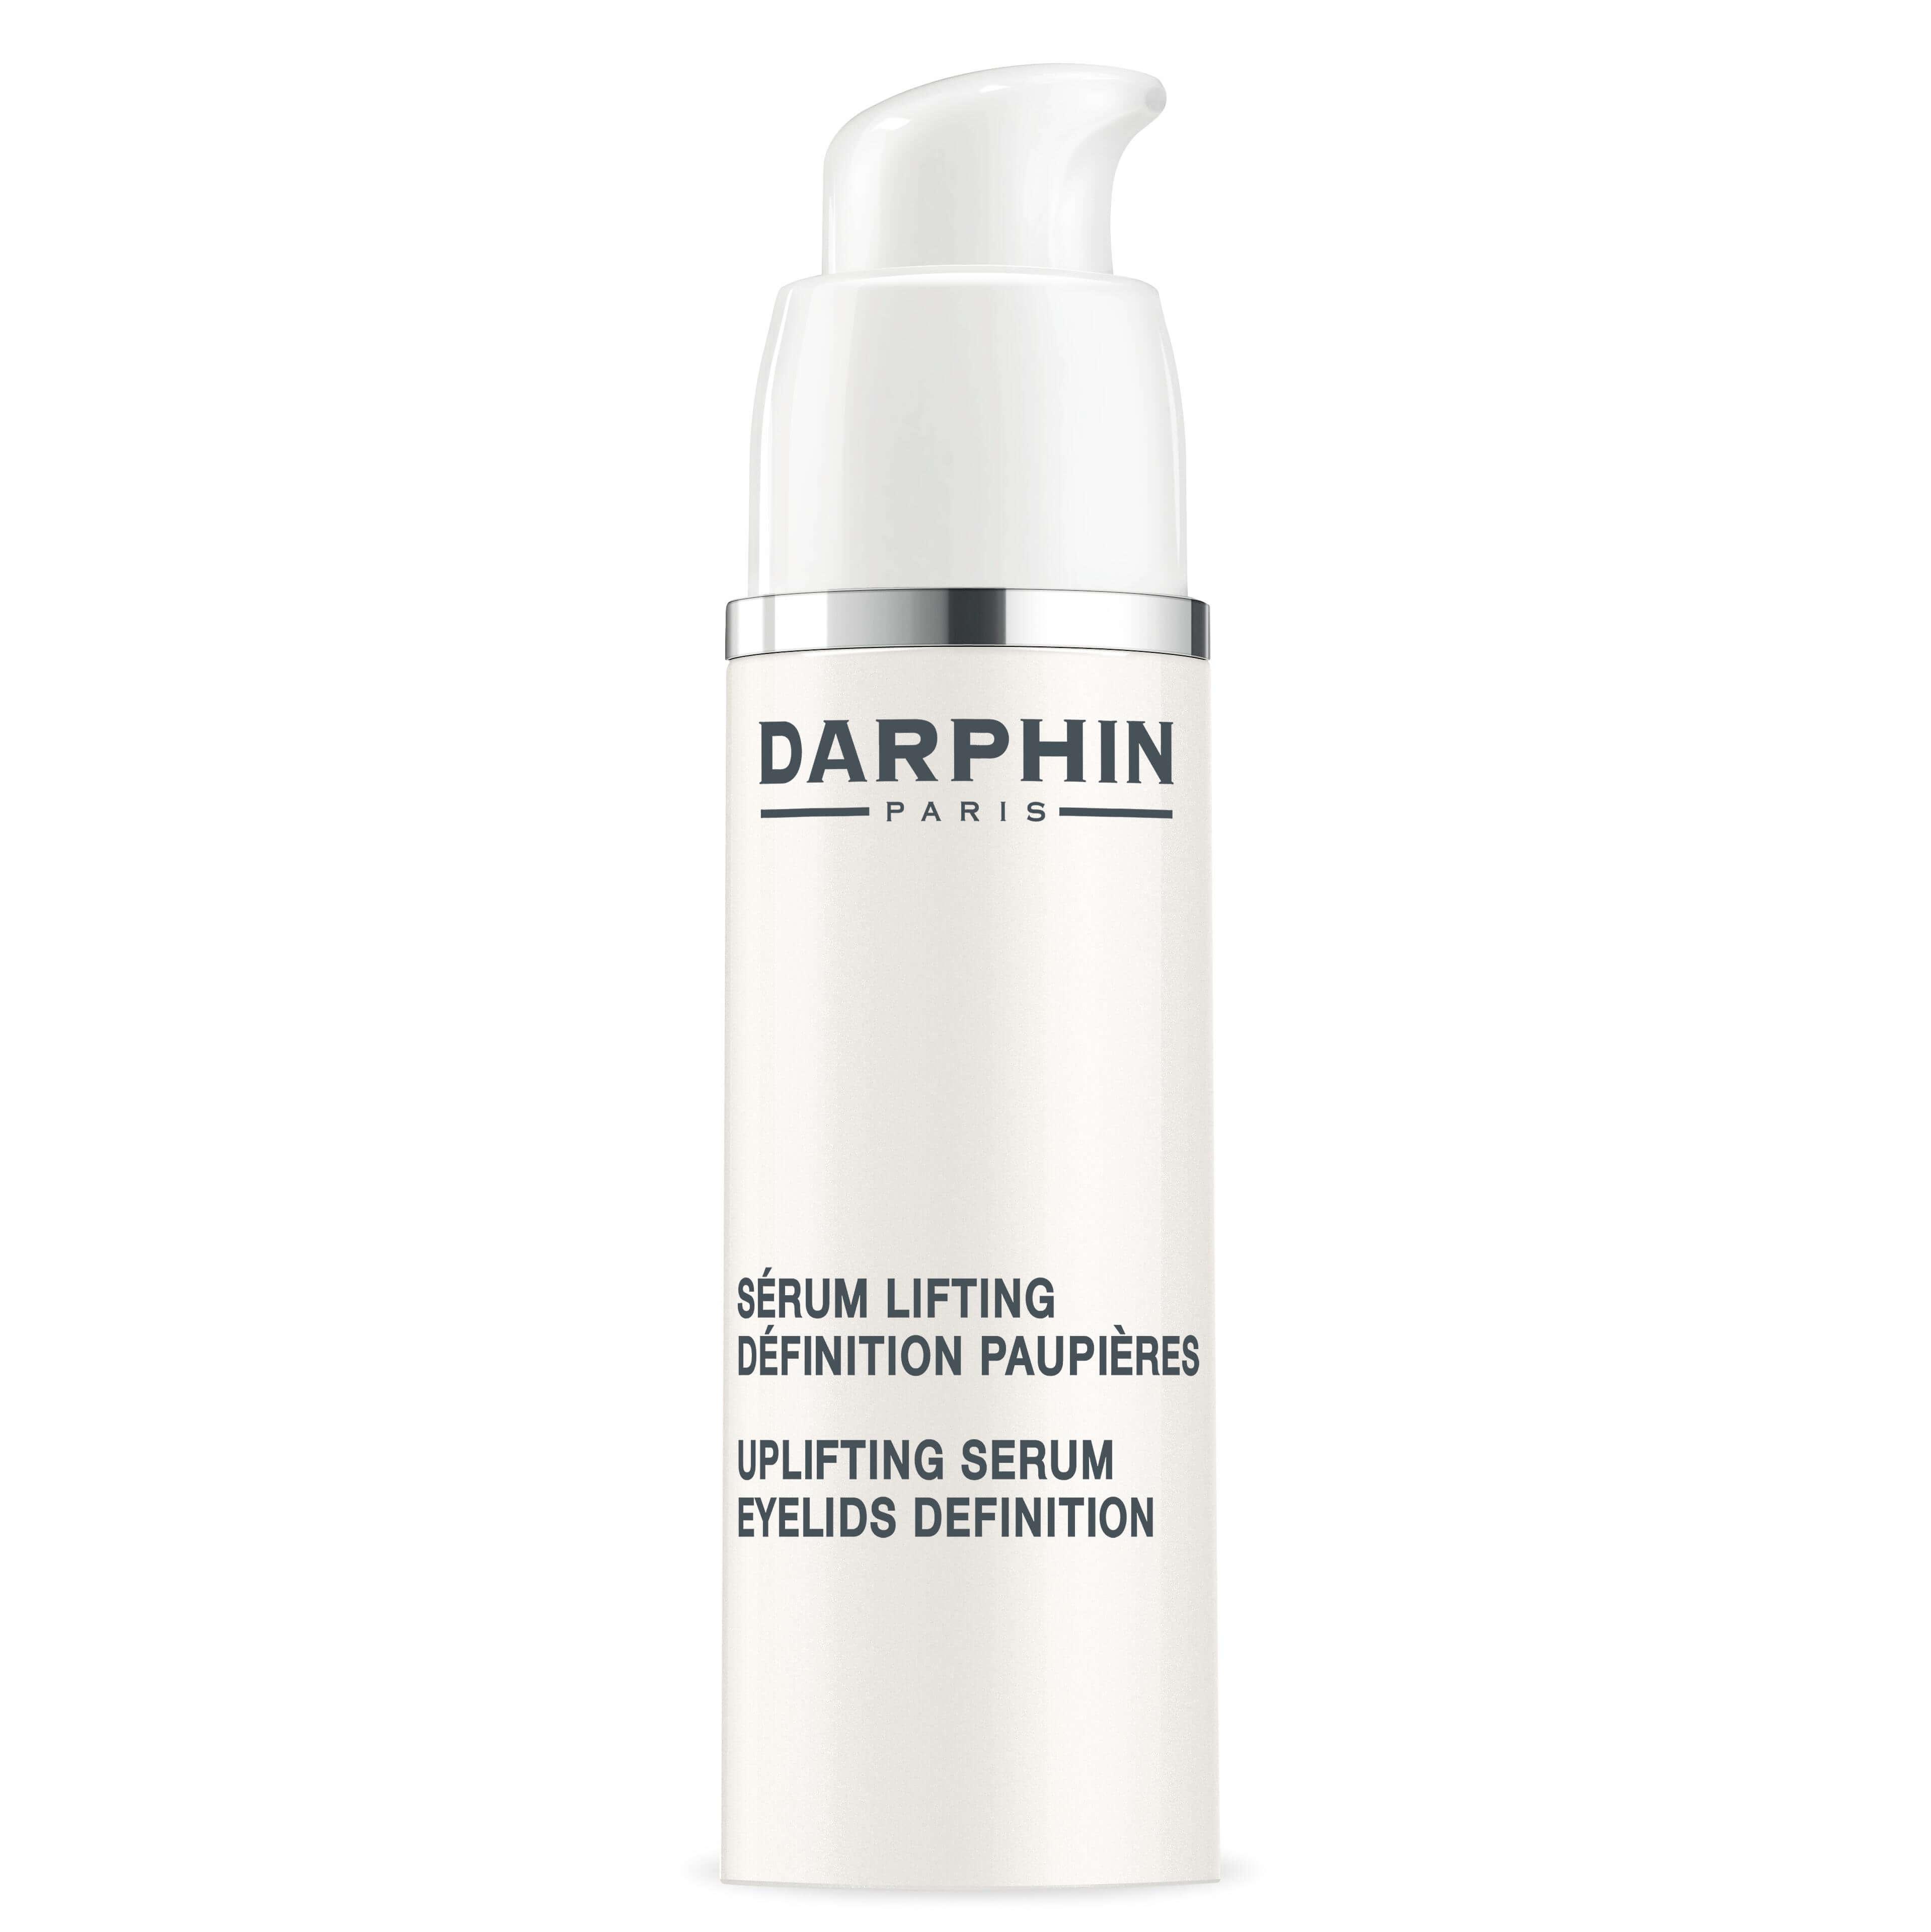 Darphin Eye Care Serum Uplifting Eyelids Definition Τονωτικός Ορός Λείανσης & Σύσφιξης για τα Μάτια για πιο Ζωντανό Βλέμμα 15ml